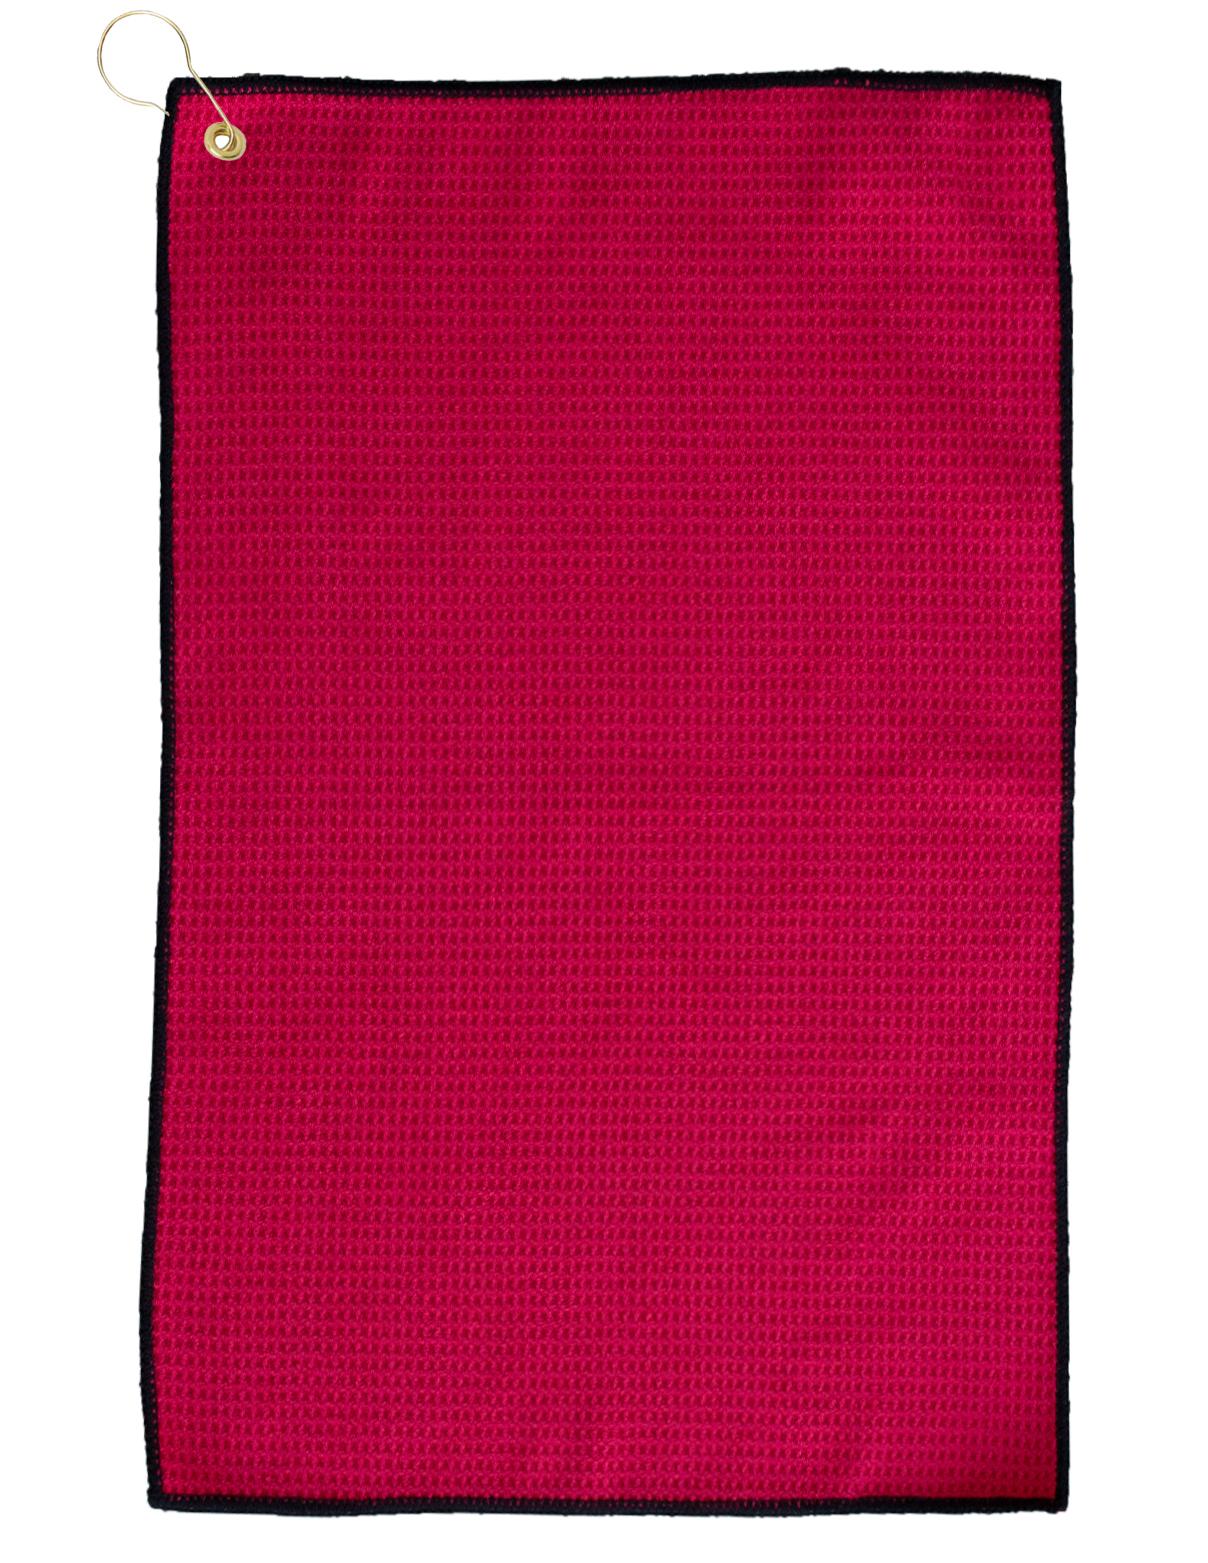 MW26CG-Red